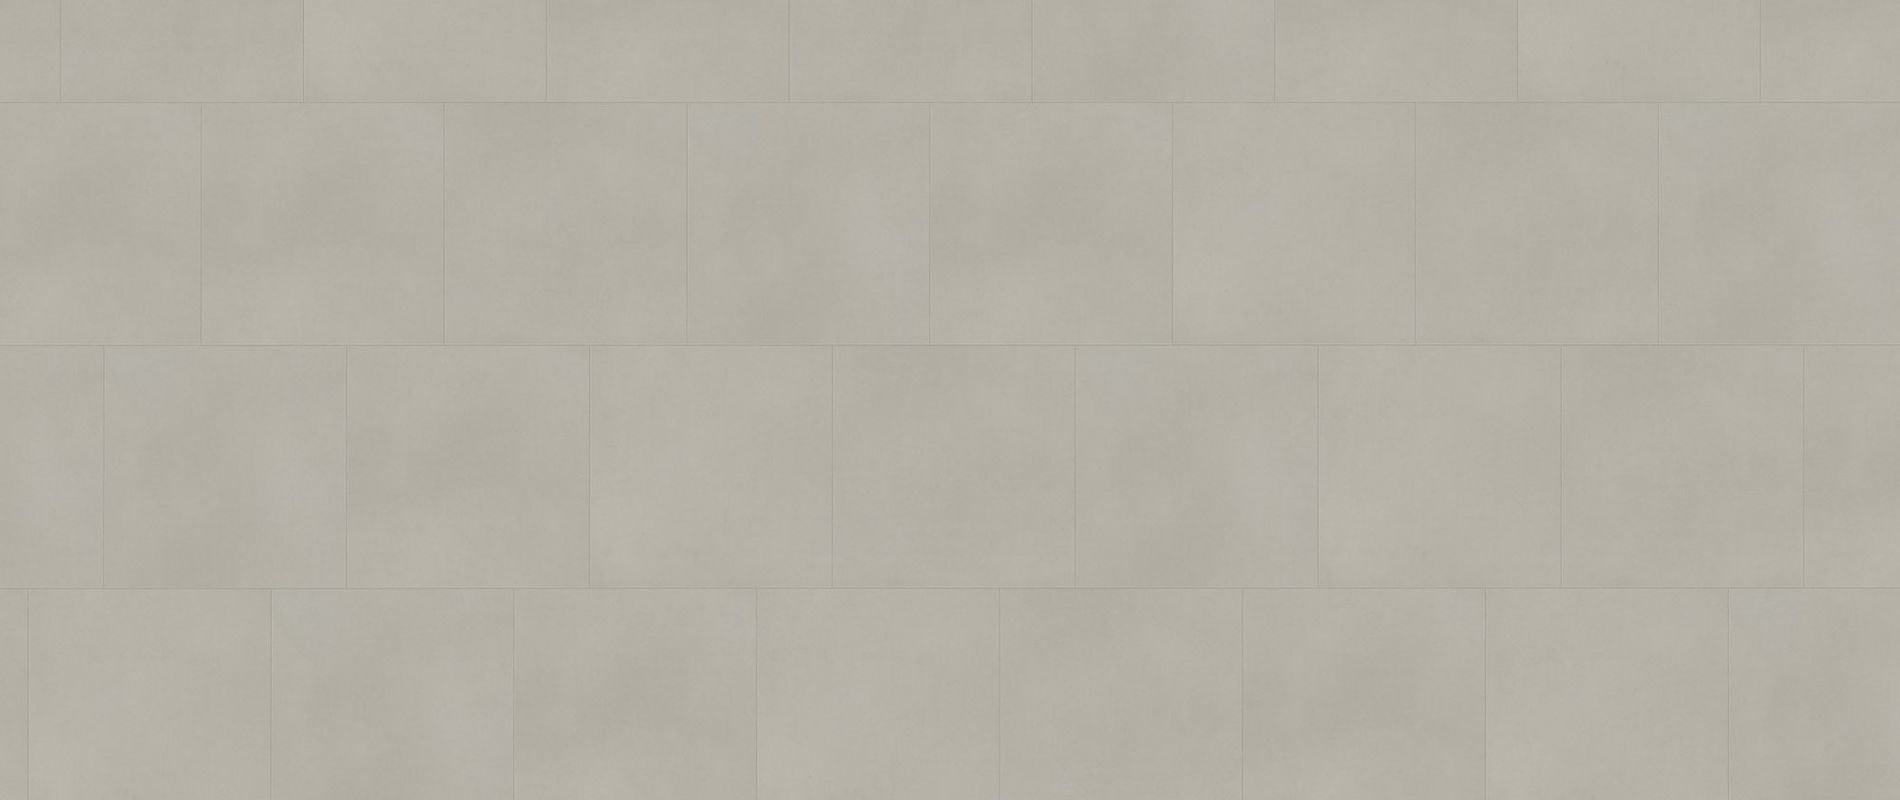 Виниловая плитка Wineo - 800 Tile Solid Light (DB00101-2)